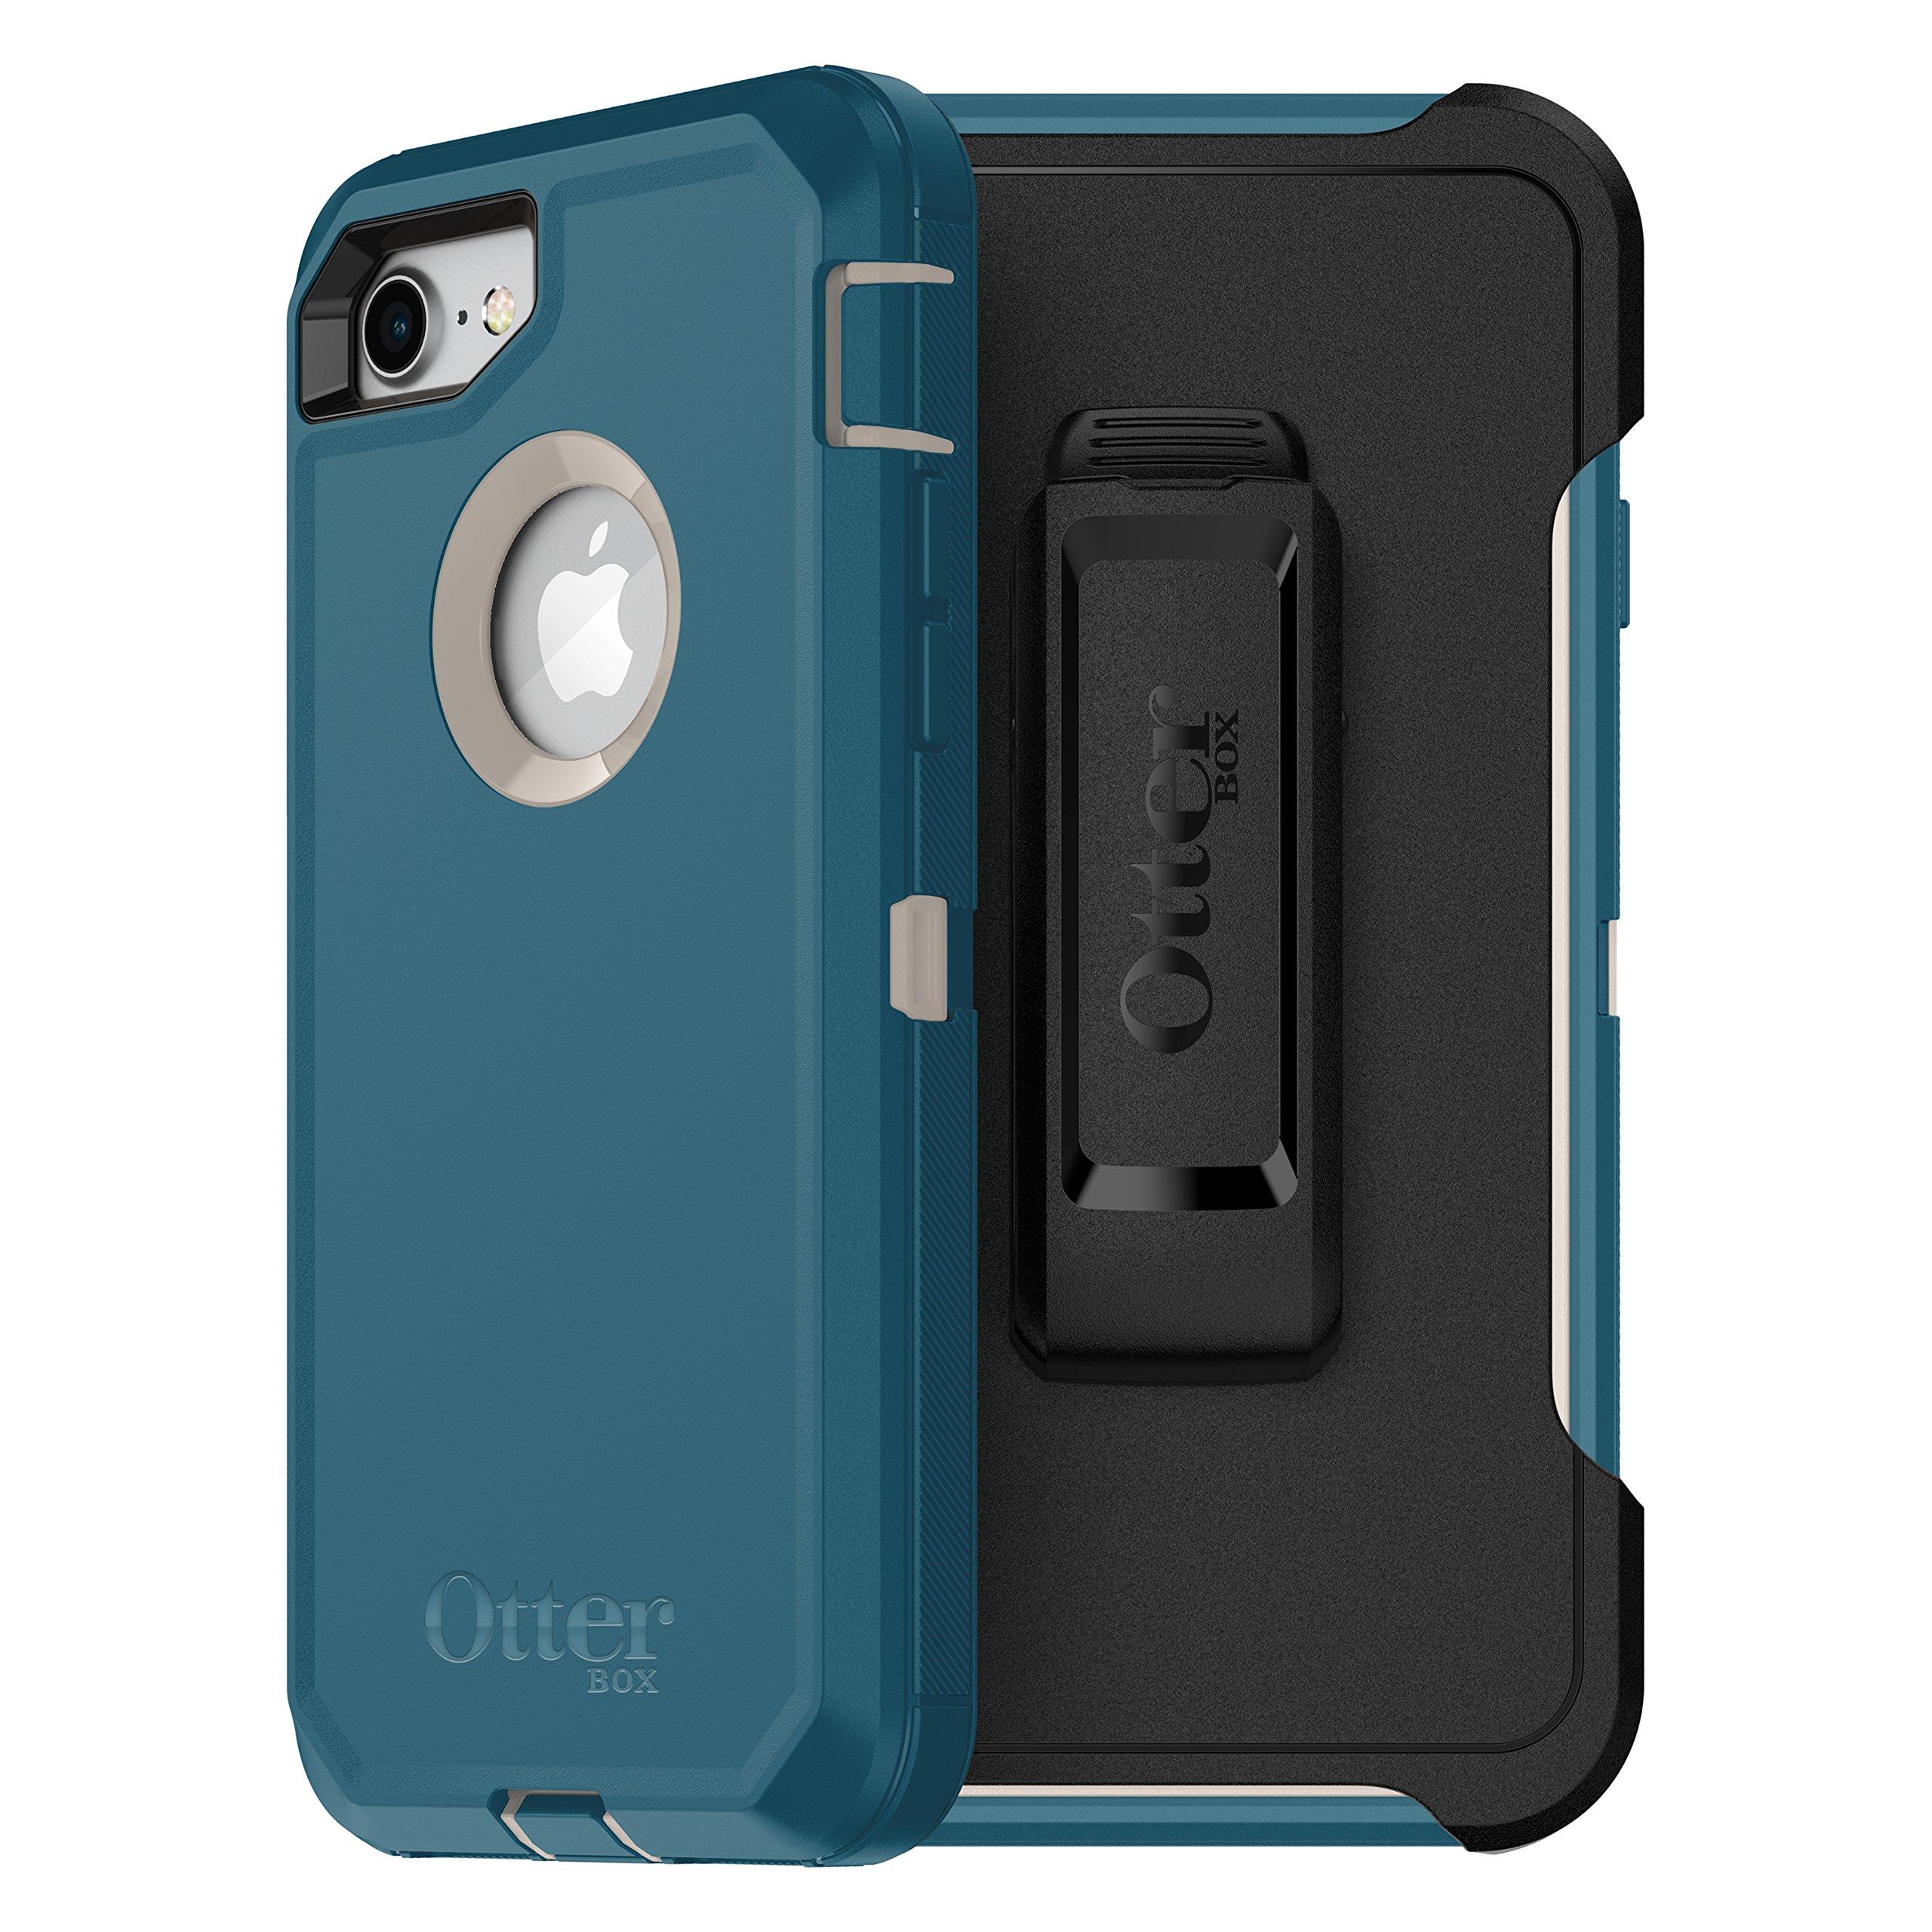 OtterBox DEFENDER SERIES Case for iPhone 8 & iPhone 7 (NOT Plus) - Frustration Free Packaging - BIG SUR (PALE BEIGE/CORSAIR)